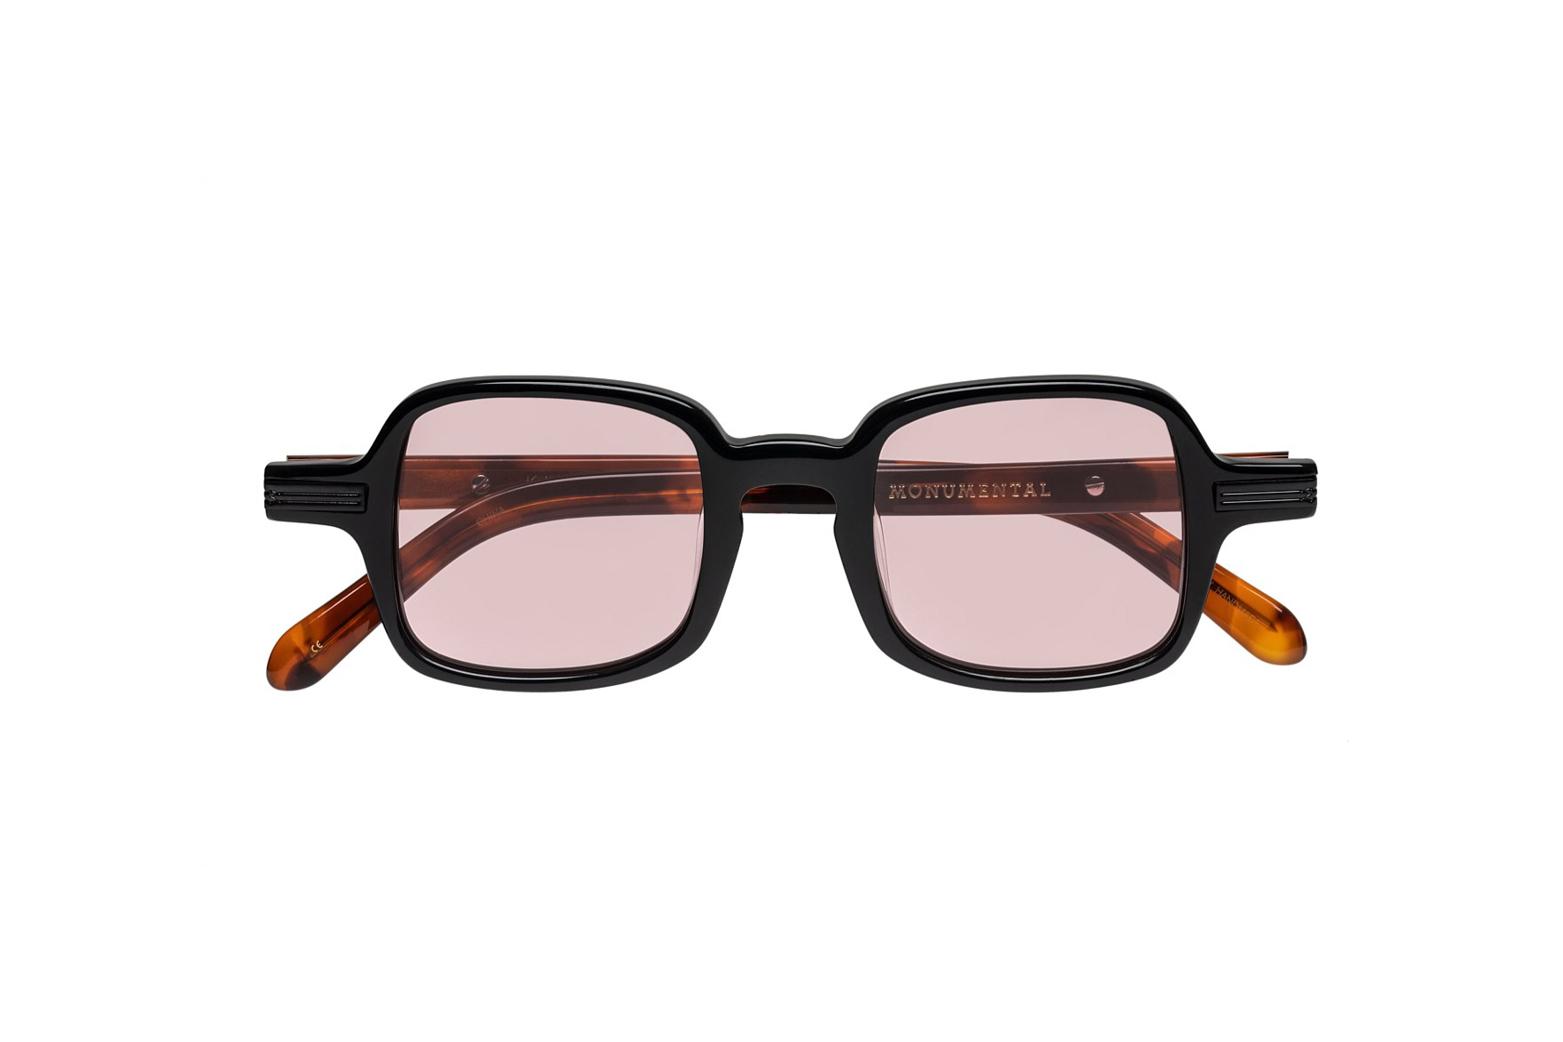 Fry Black Copper Tint Sunglasses